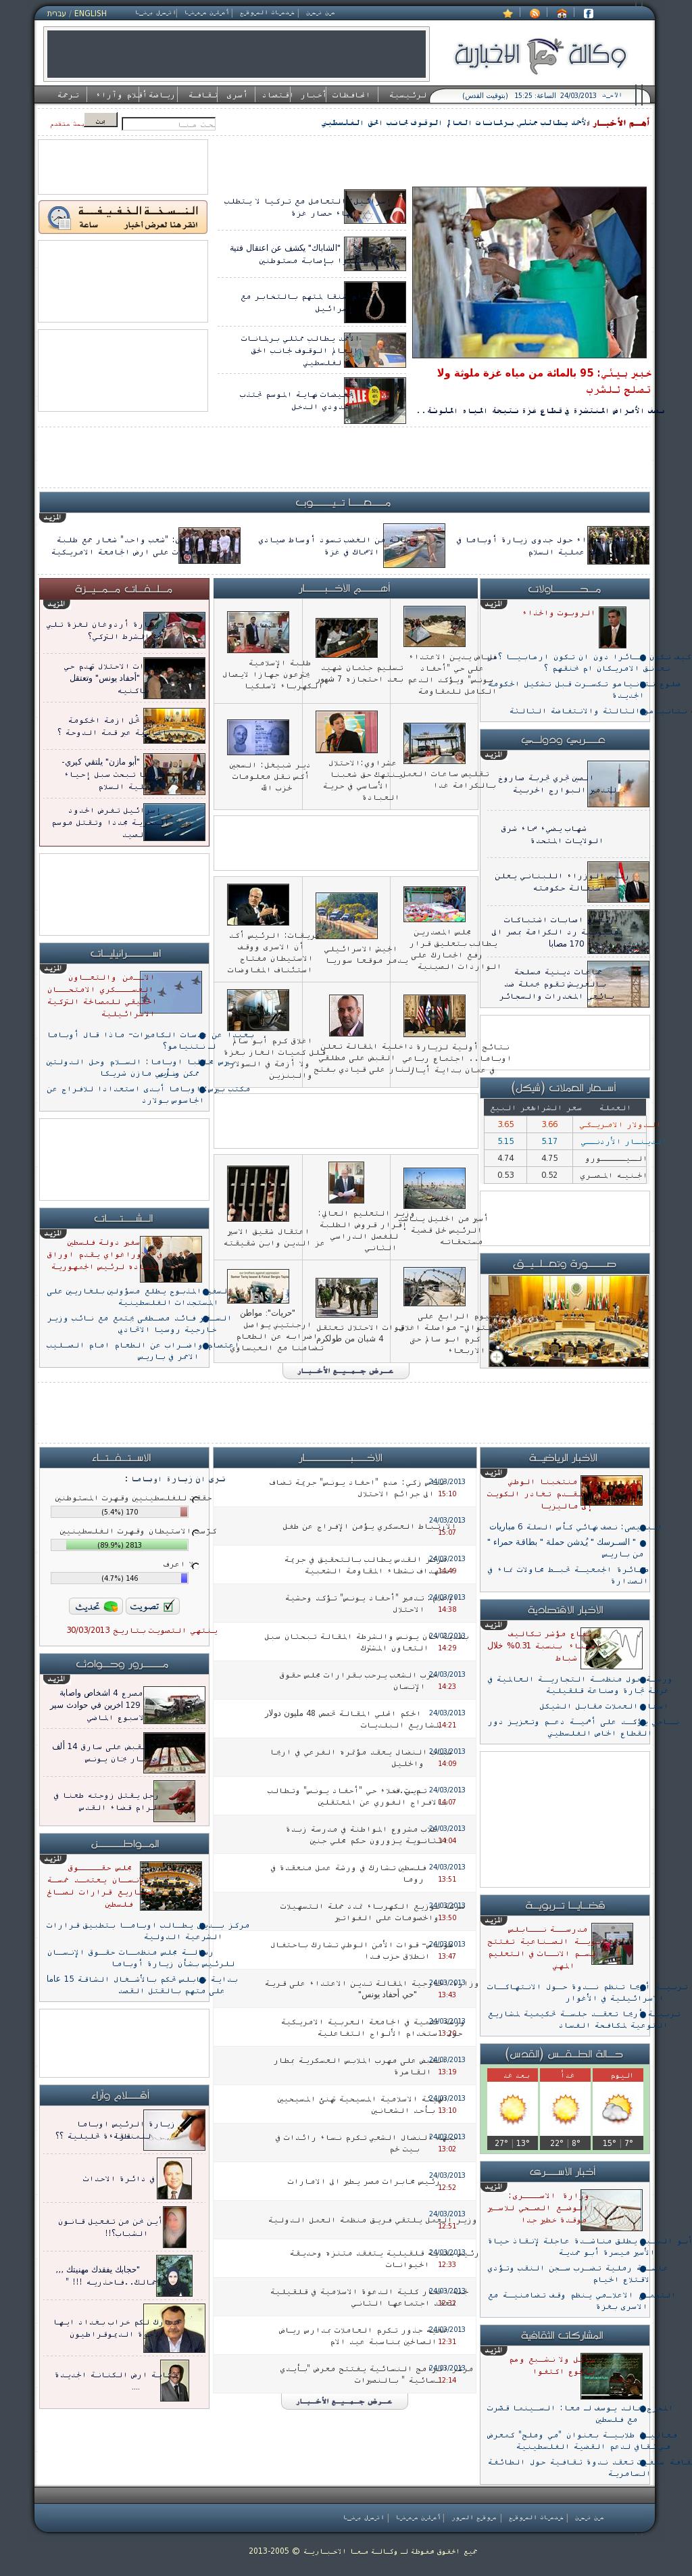 Ma'an News at Sunday March 24, 2013, 1:25 p.m. UTC